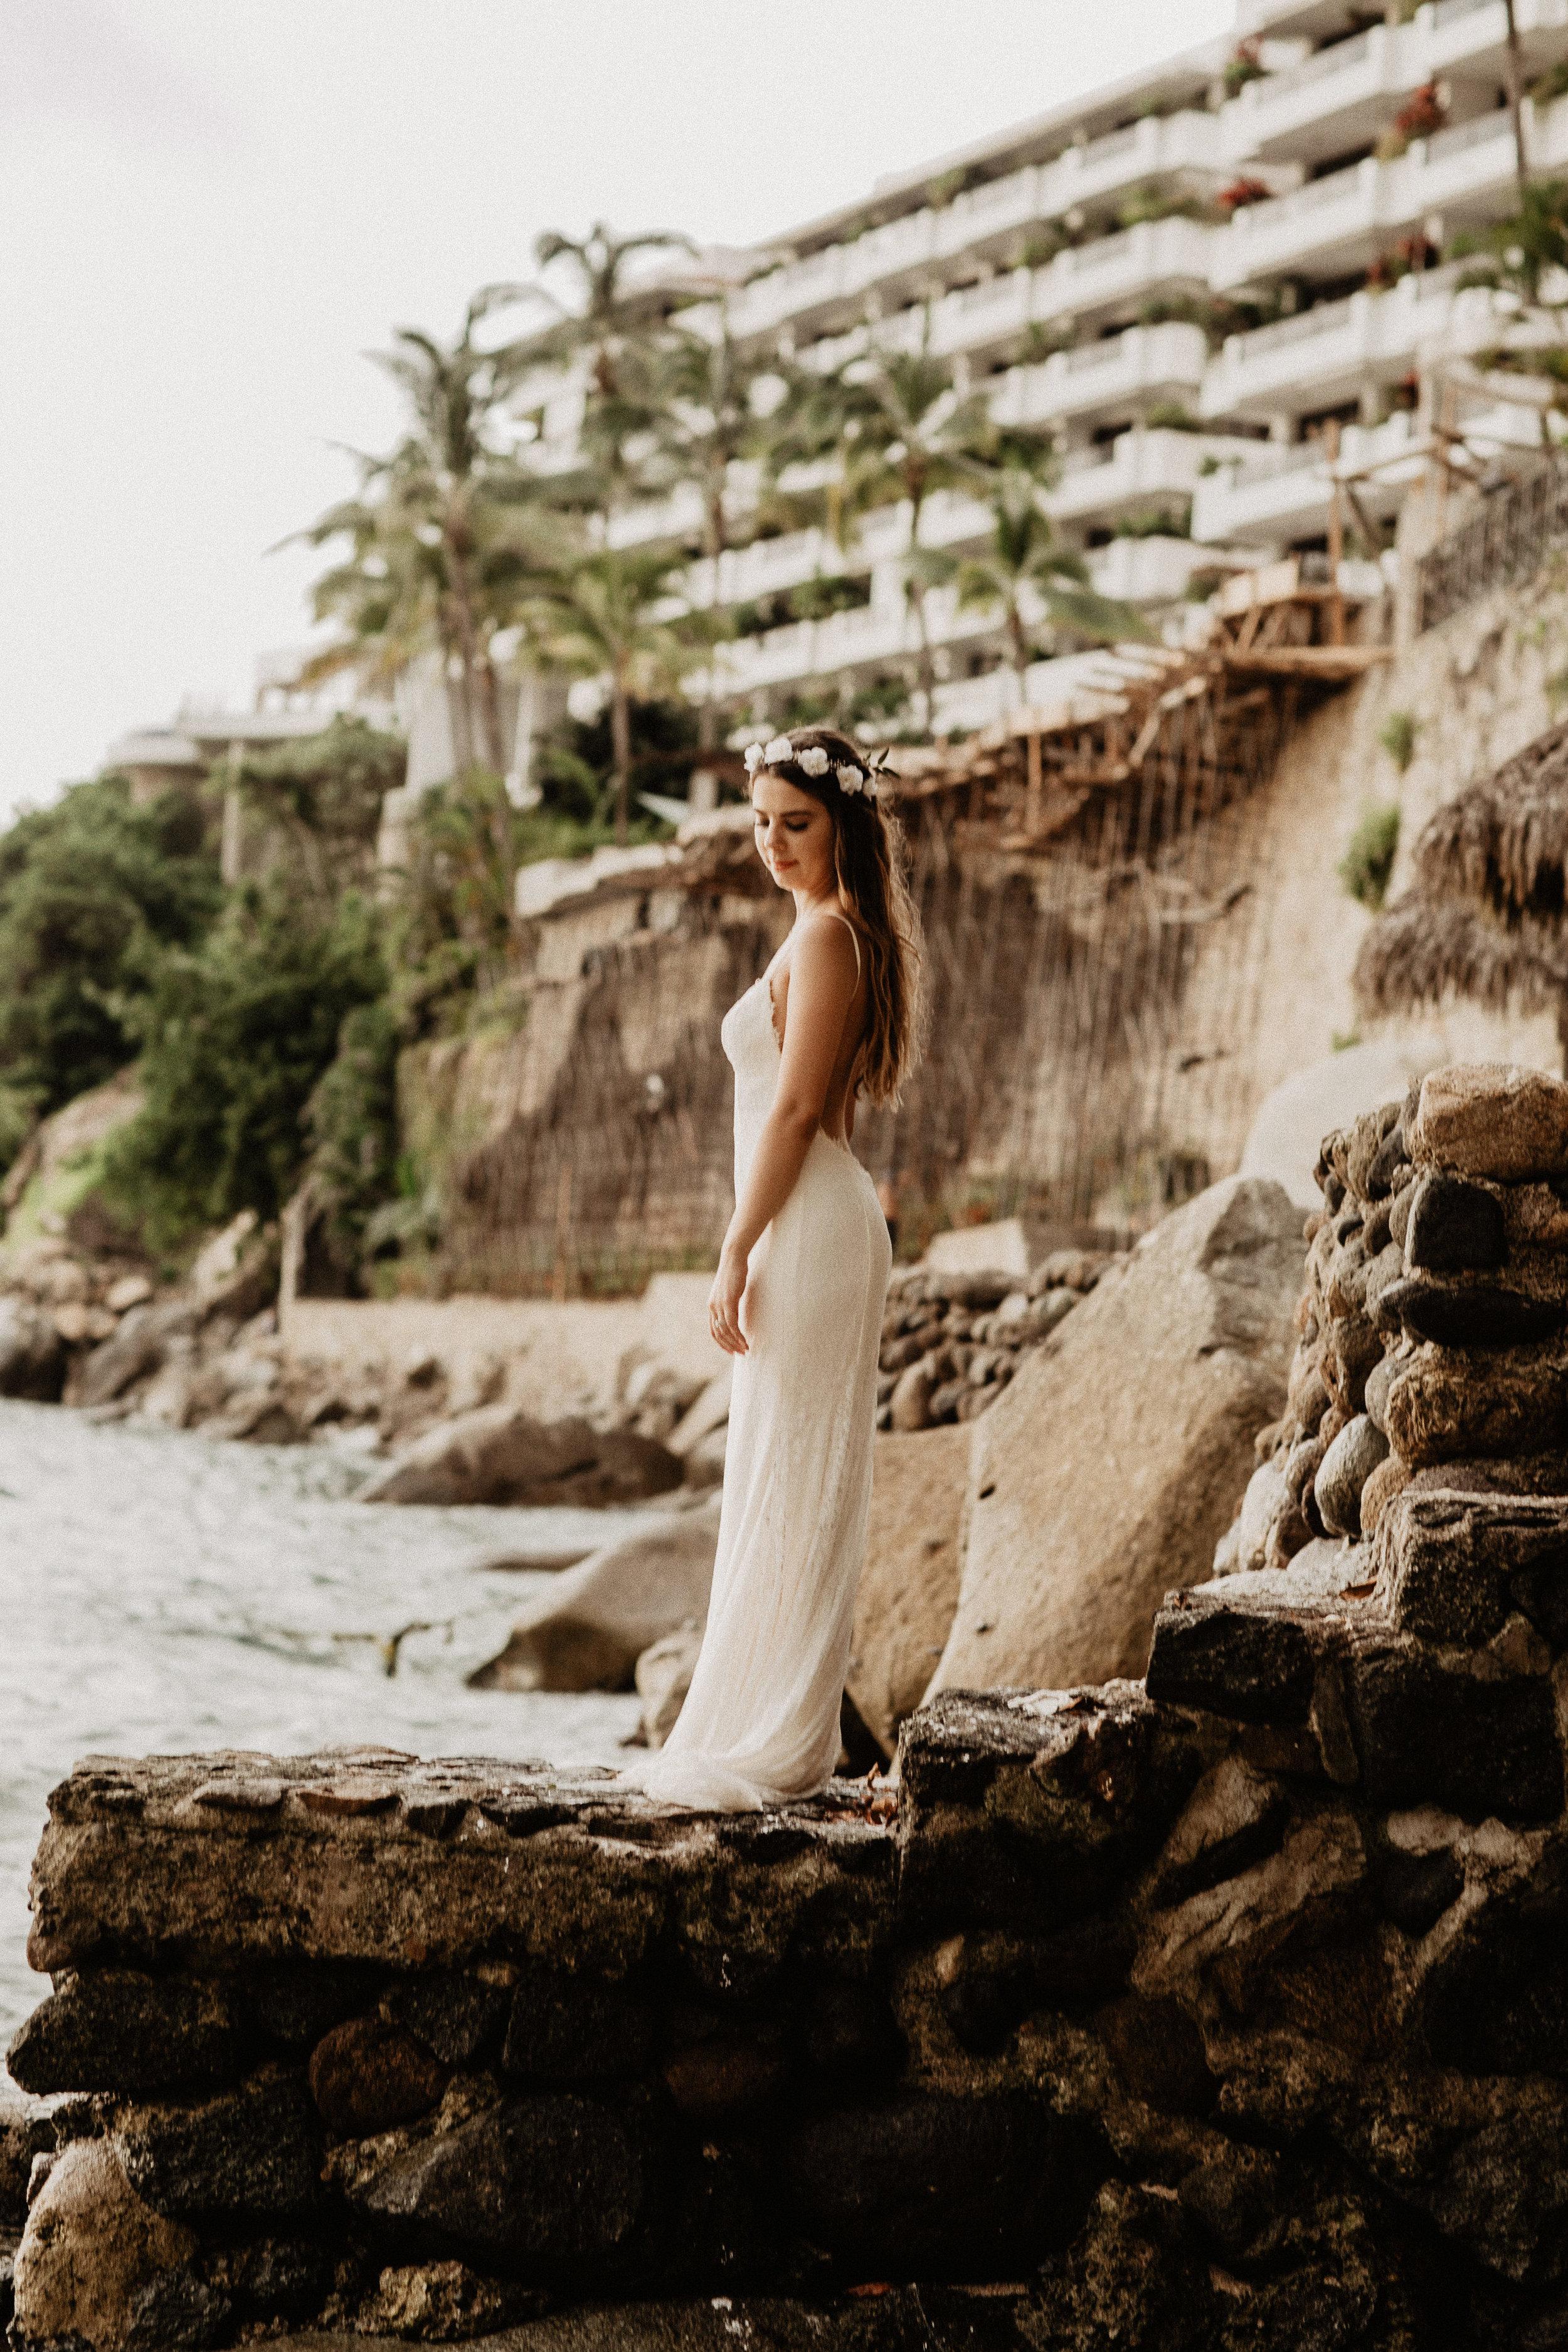 alfonso_flores_destination_wedding_photography_puerto_vallarta_hotel_barcelo_vallarta_cuttler_amela-752.JPG